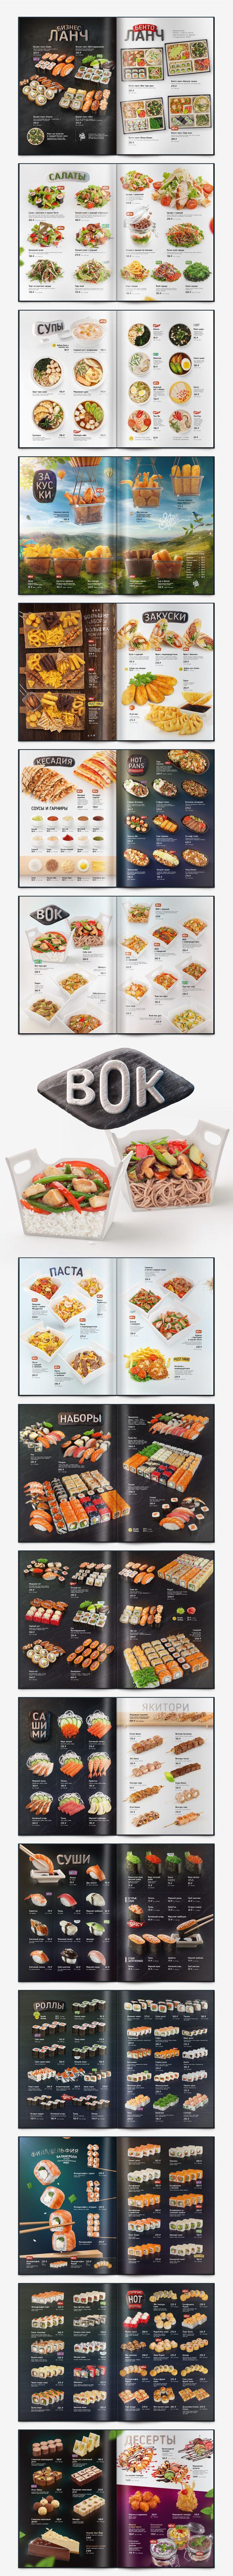 Menu for sushi-bar Riba.Ris on Behance